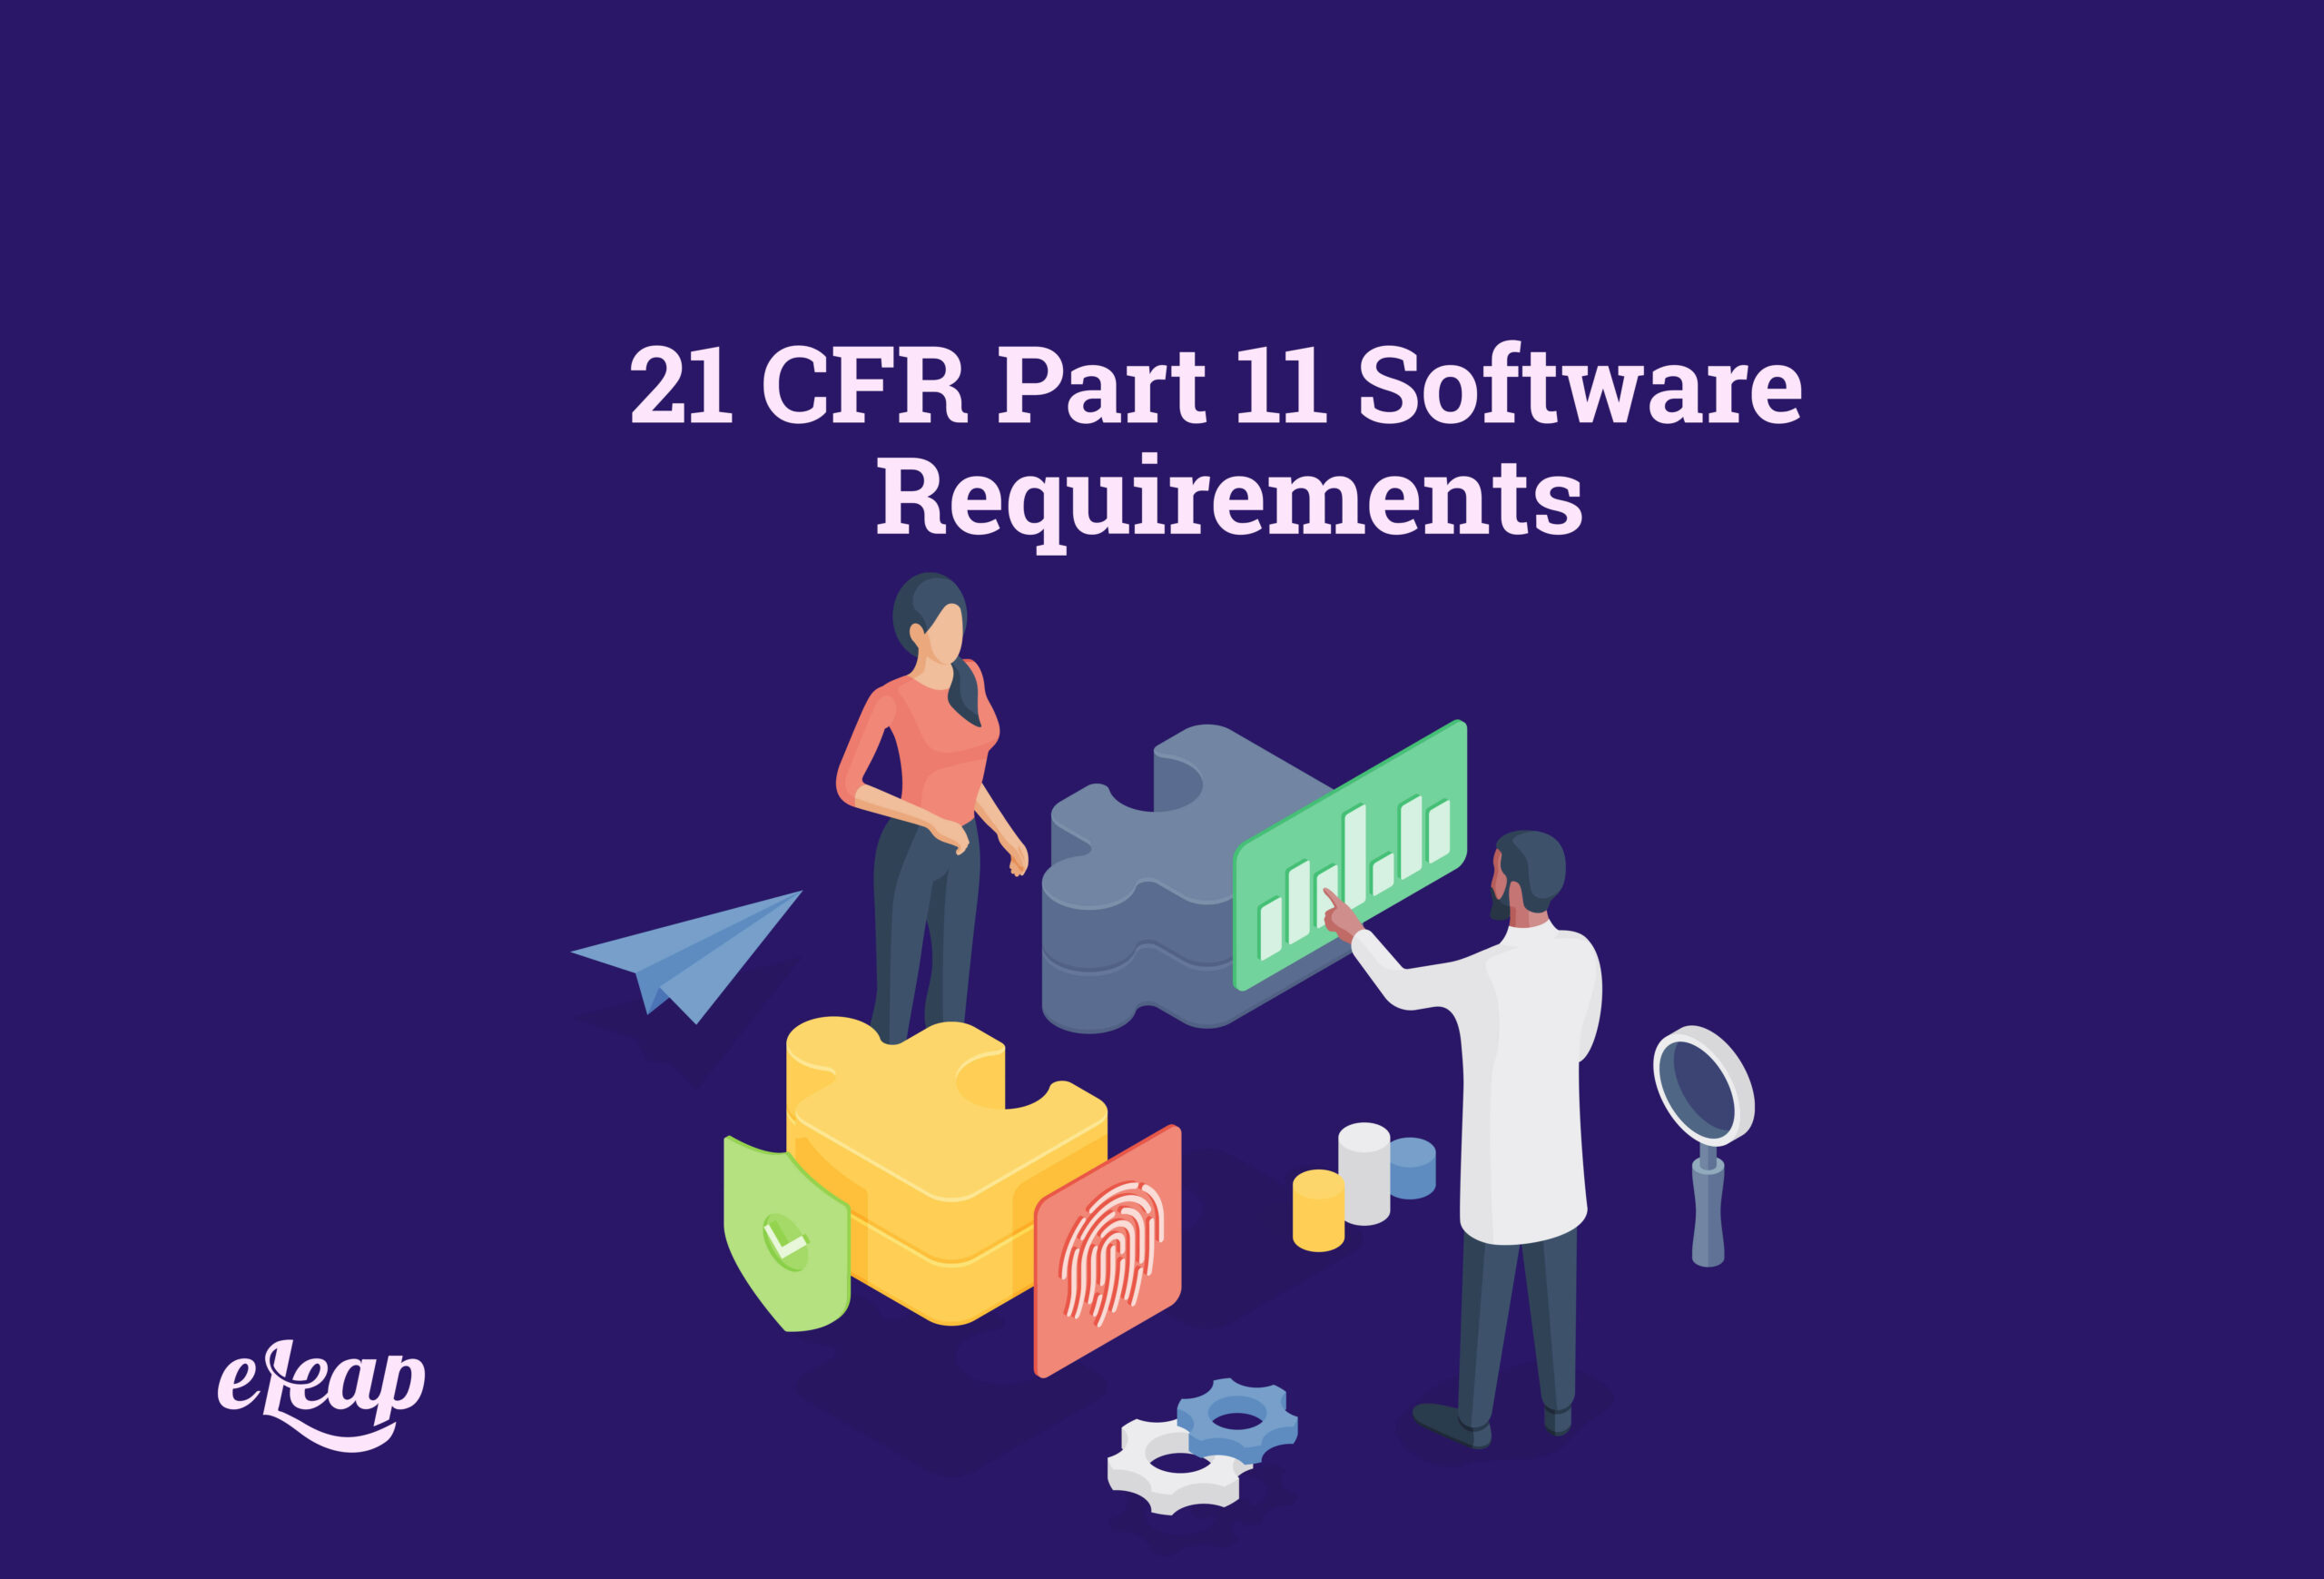 21 CFR Part 11 Software Requirements